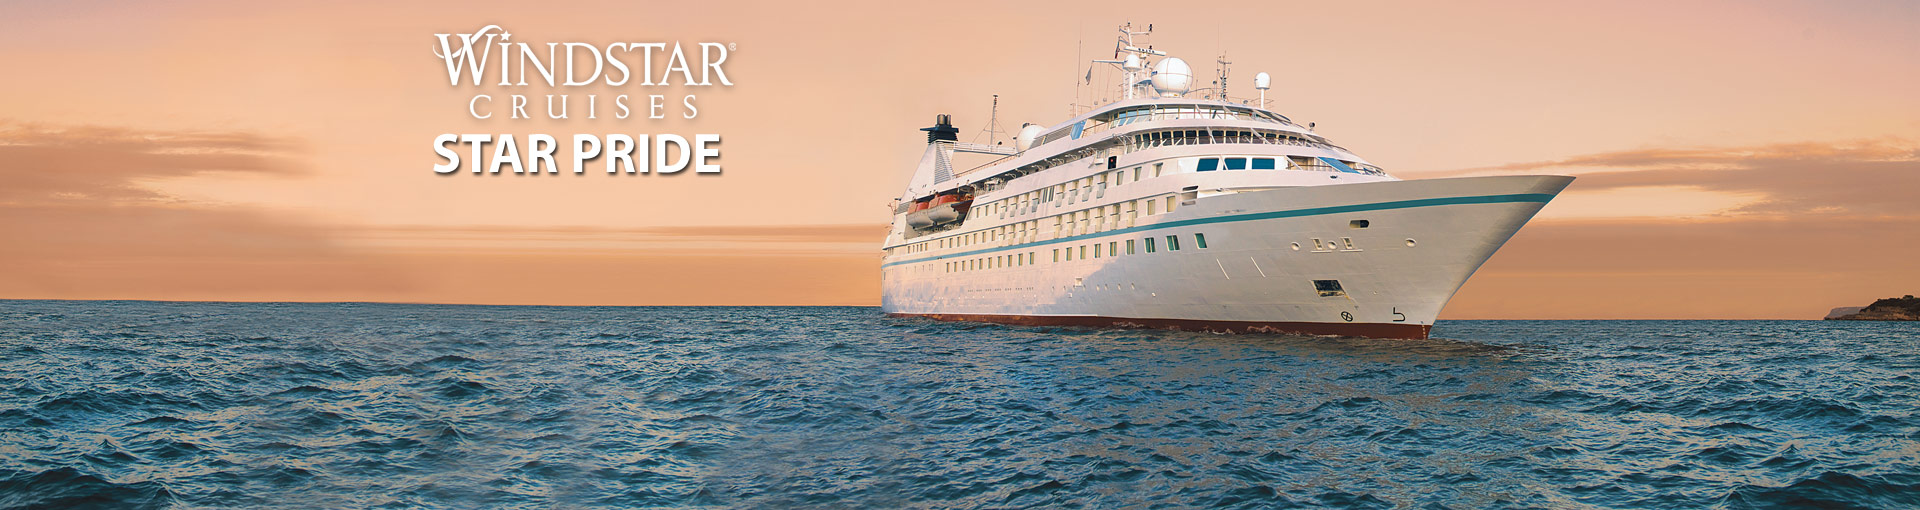 Windstar Cruises Star Pride Cruise Ship